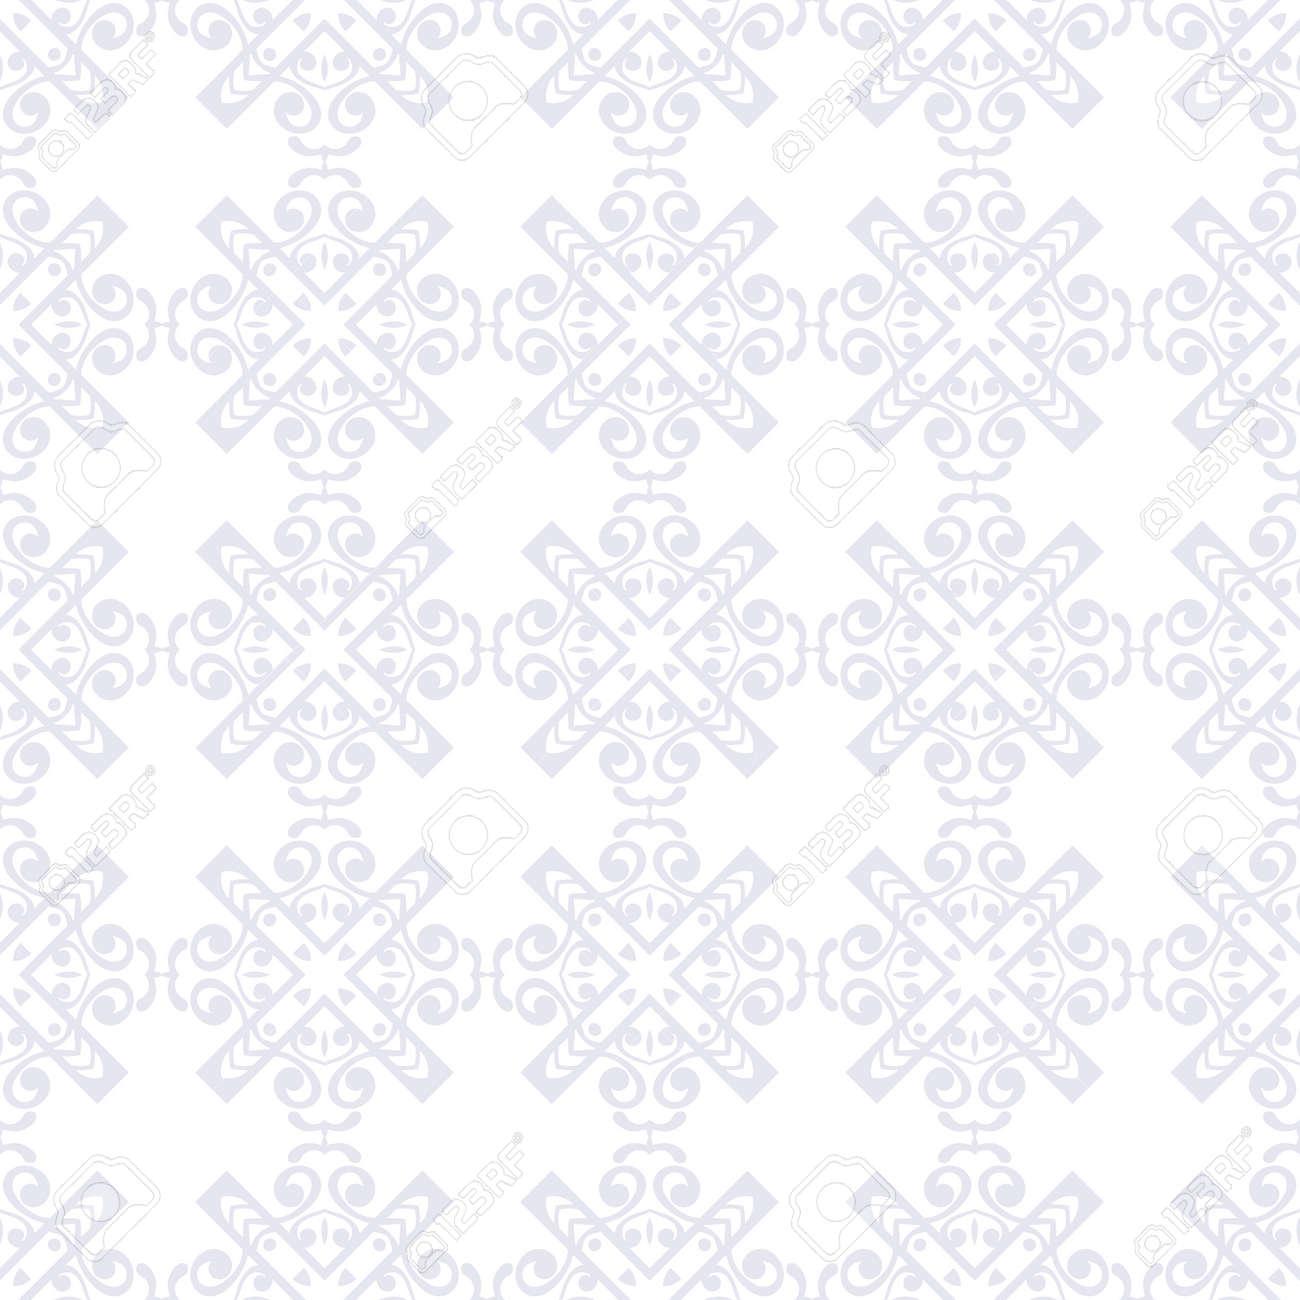 Seamless geometric modern art deco pattern background - 121471426